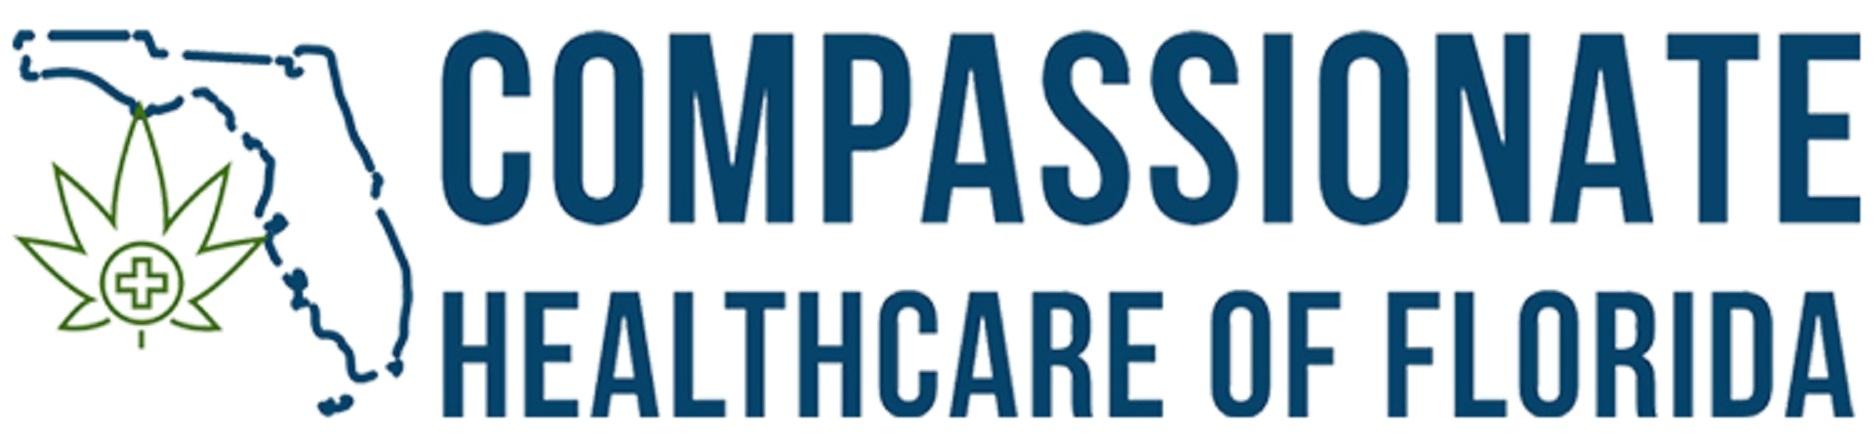 Compassionate Healthcare of Florida (@healthcare34) Cover Image